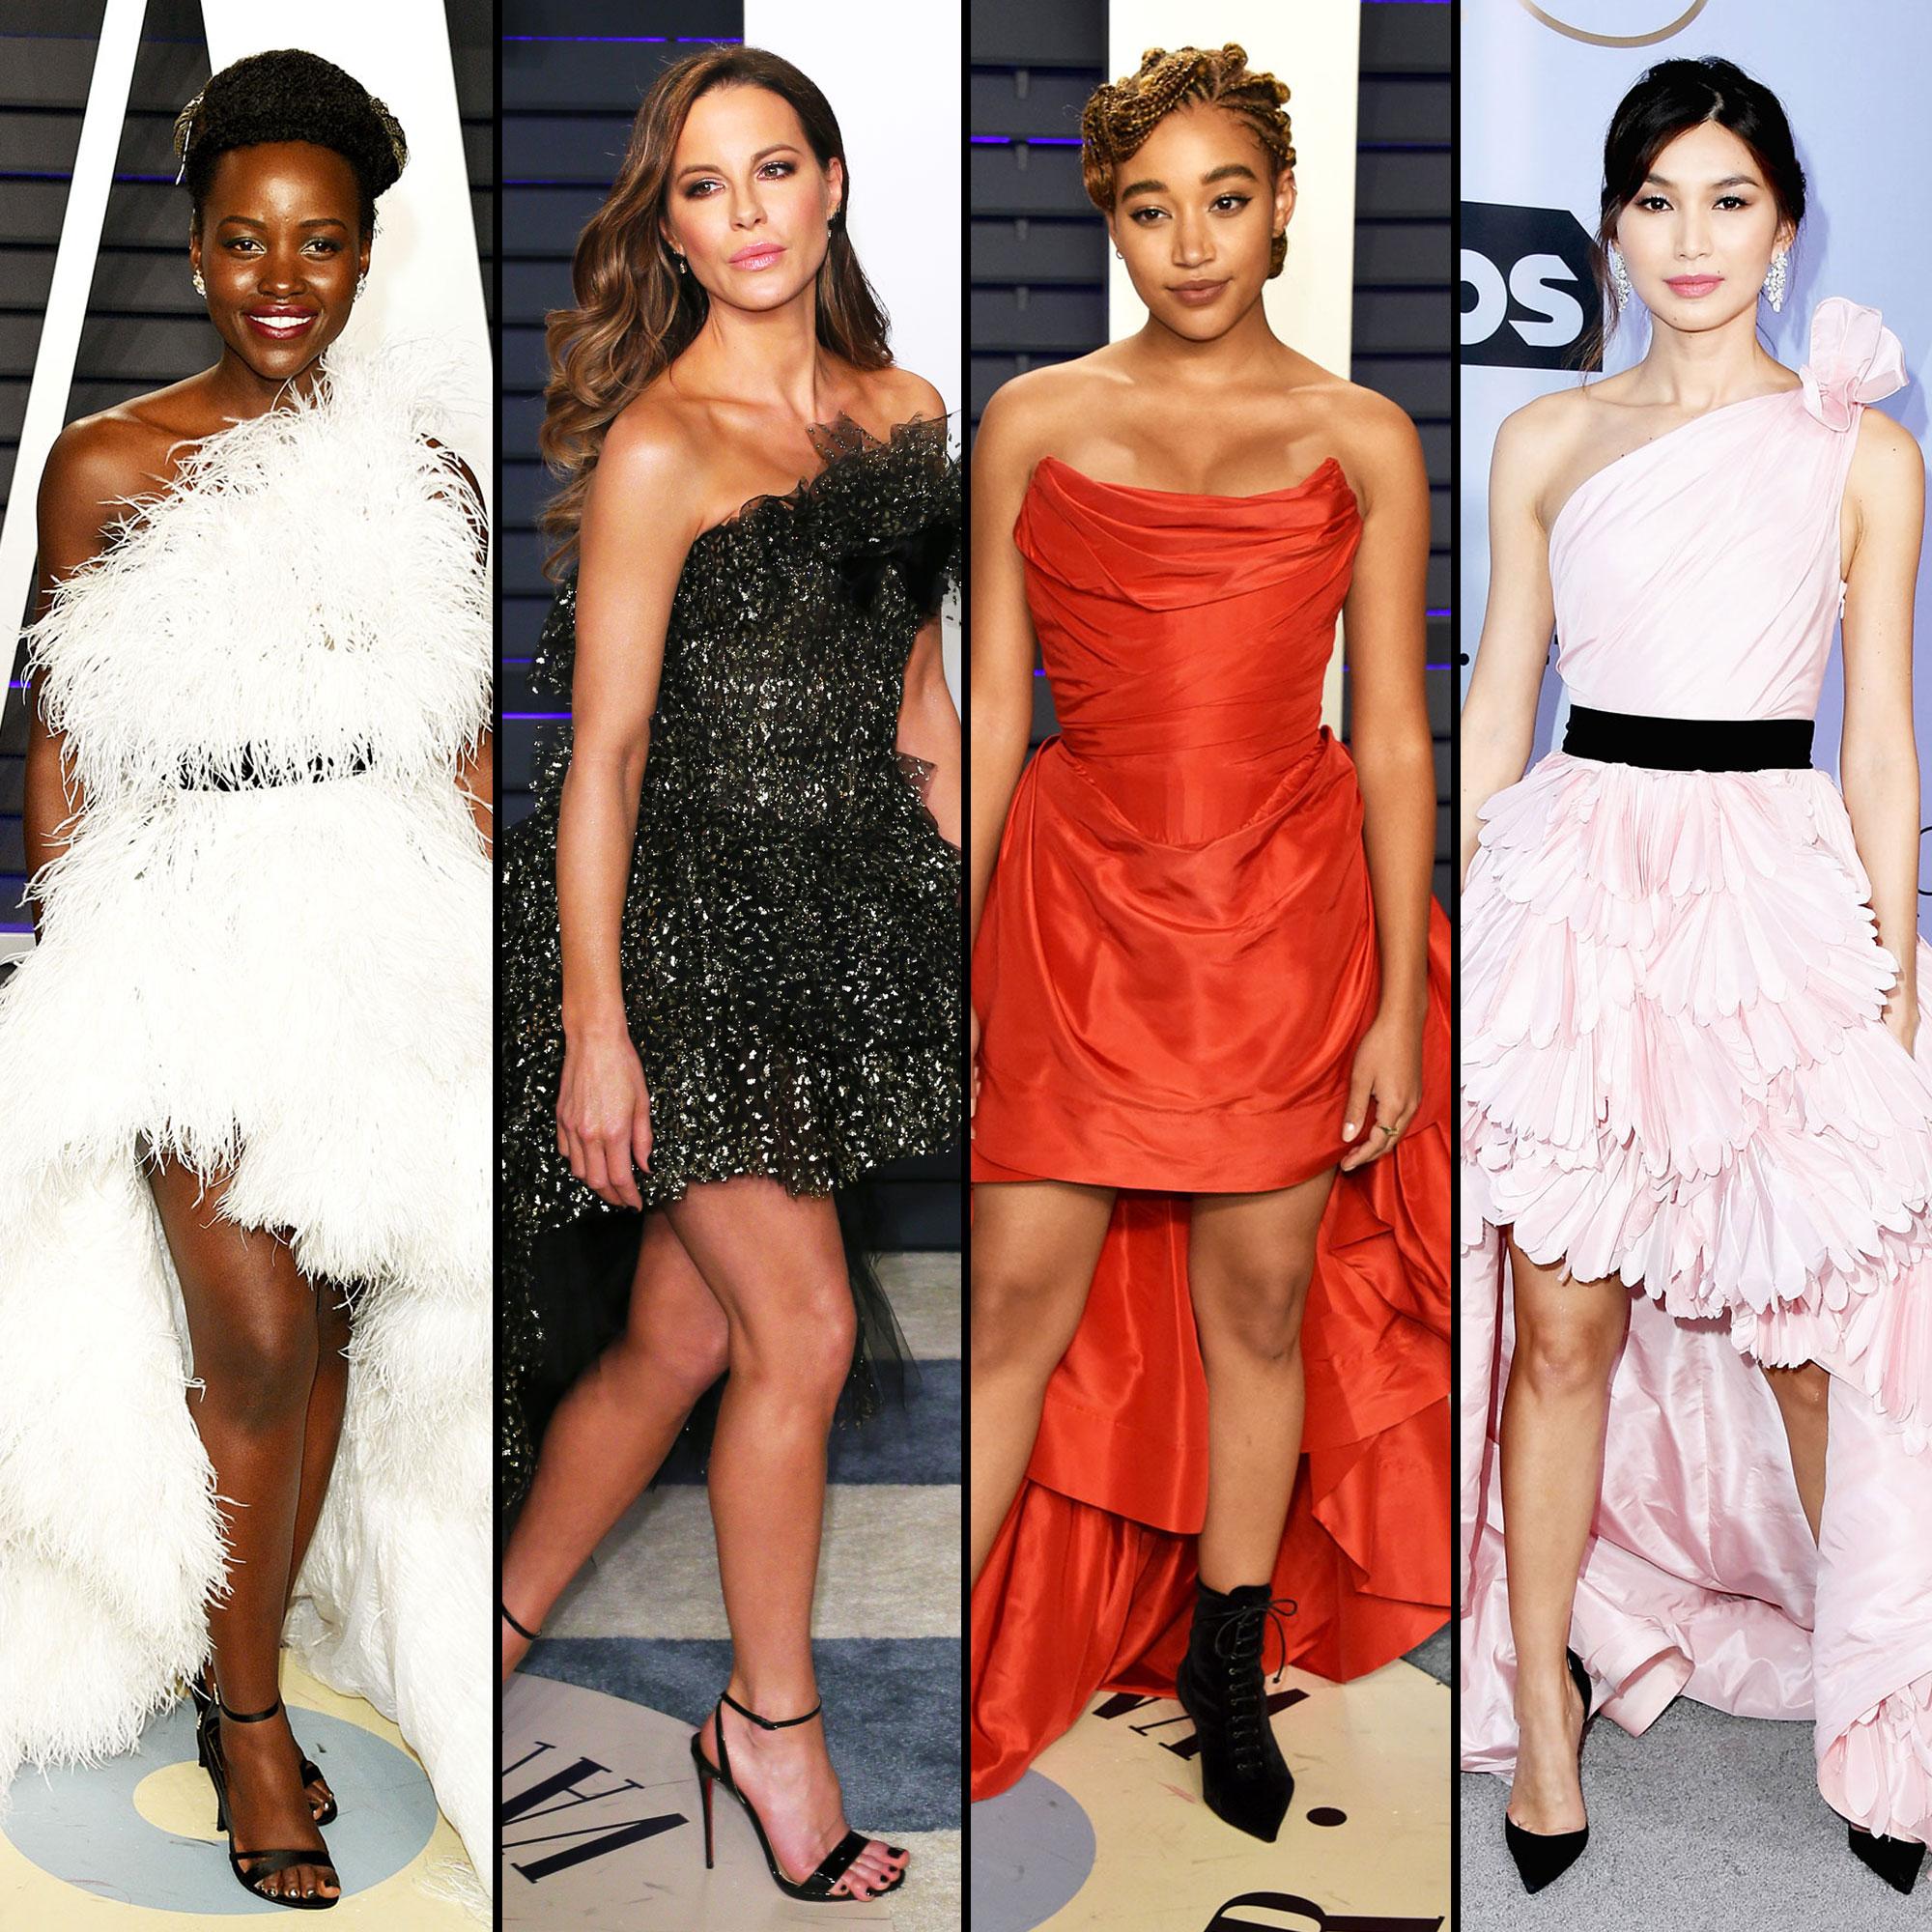 Lupita Nyong'o, Kate Beckinsale, Amandla Stenberg and Gemma Chan - Lupita Nyong'o, Kate Beckinsale, Amandla Stenberg and Gemma Chan